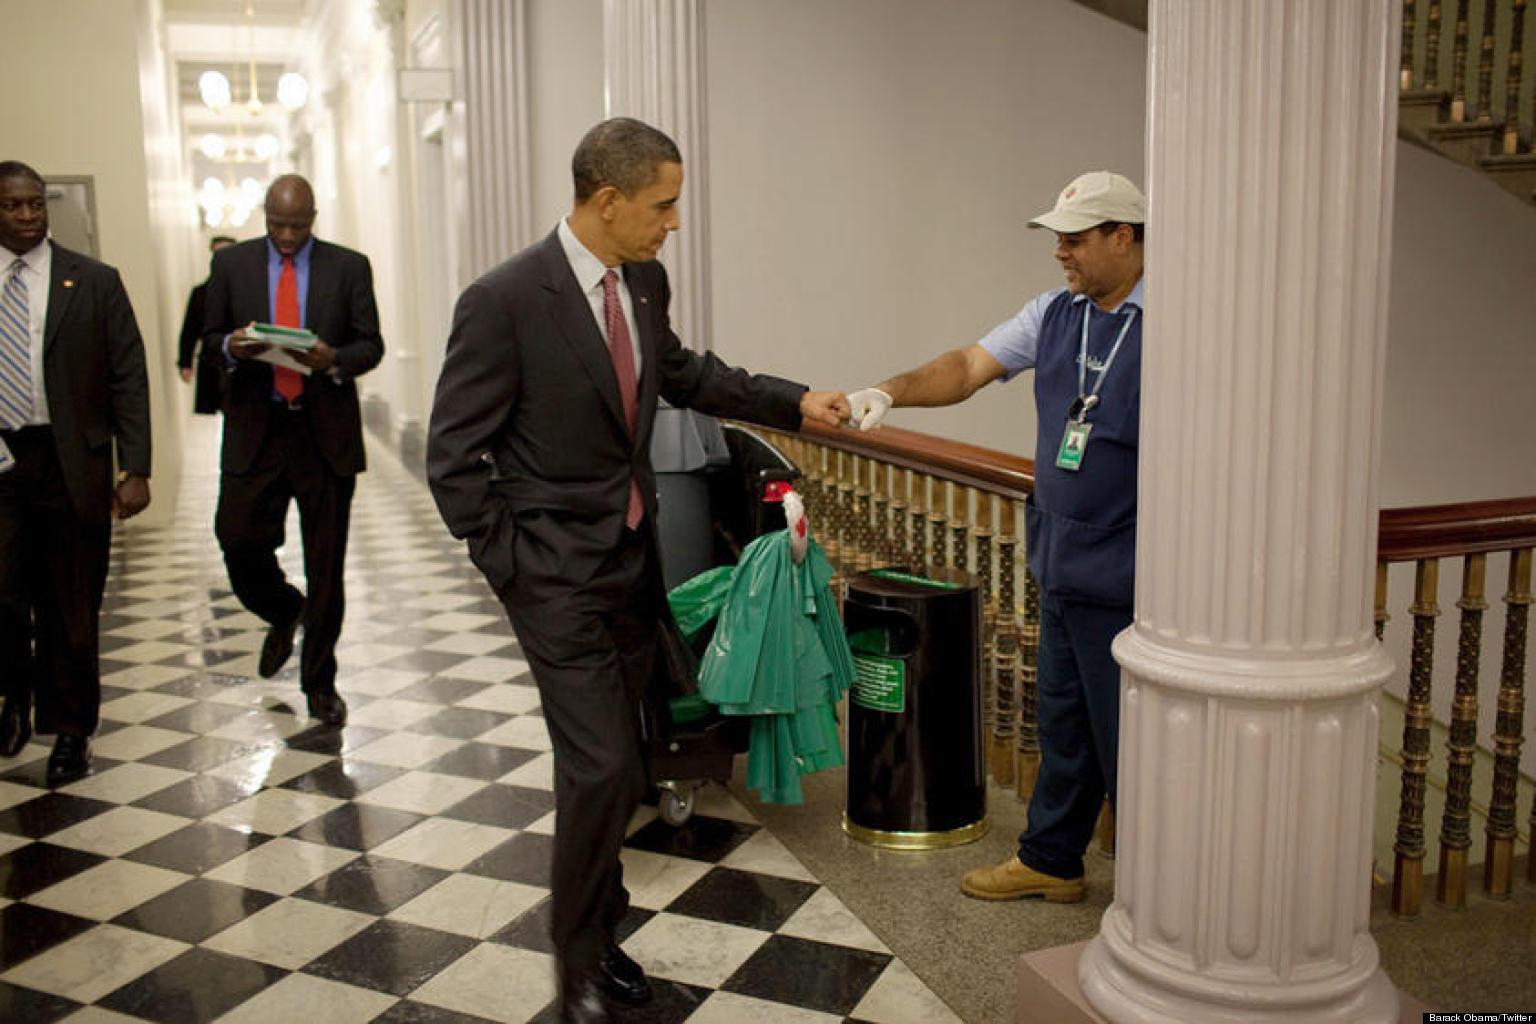 obama barack a fist bump picture sense balance